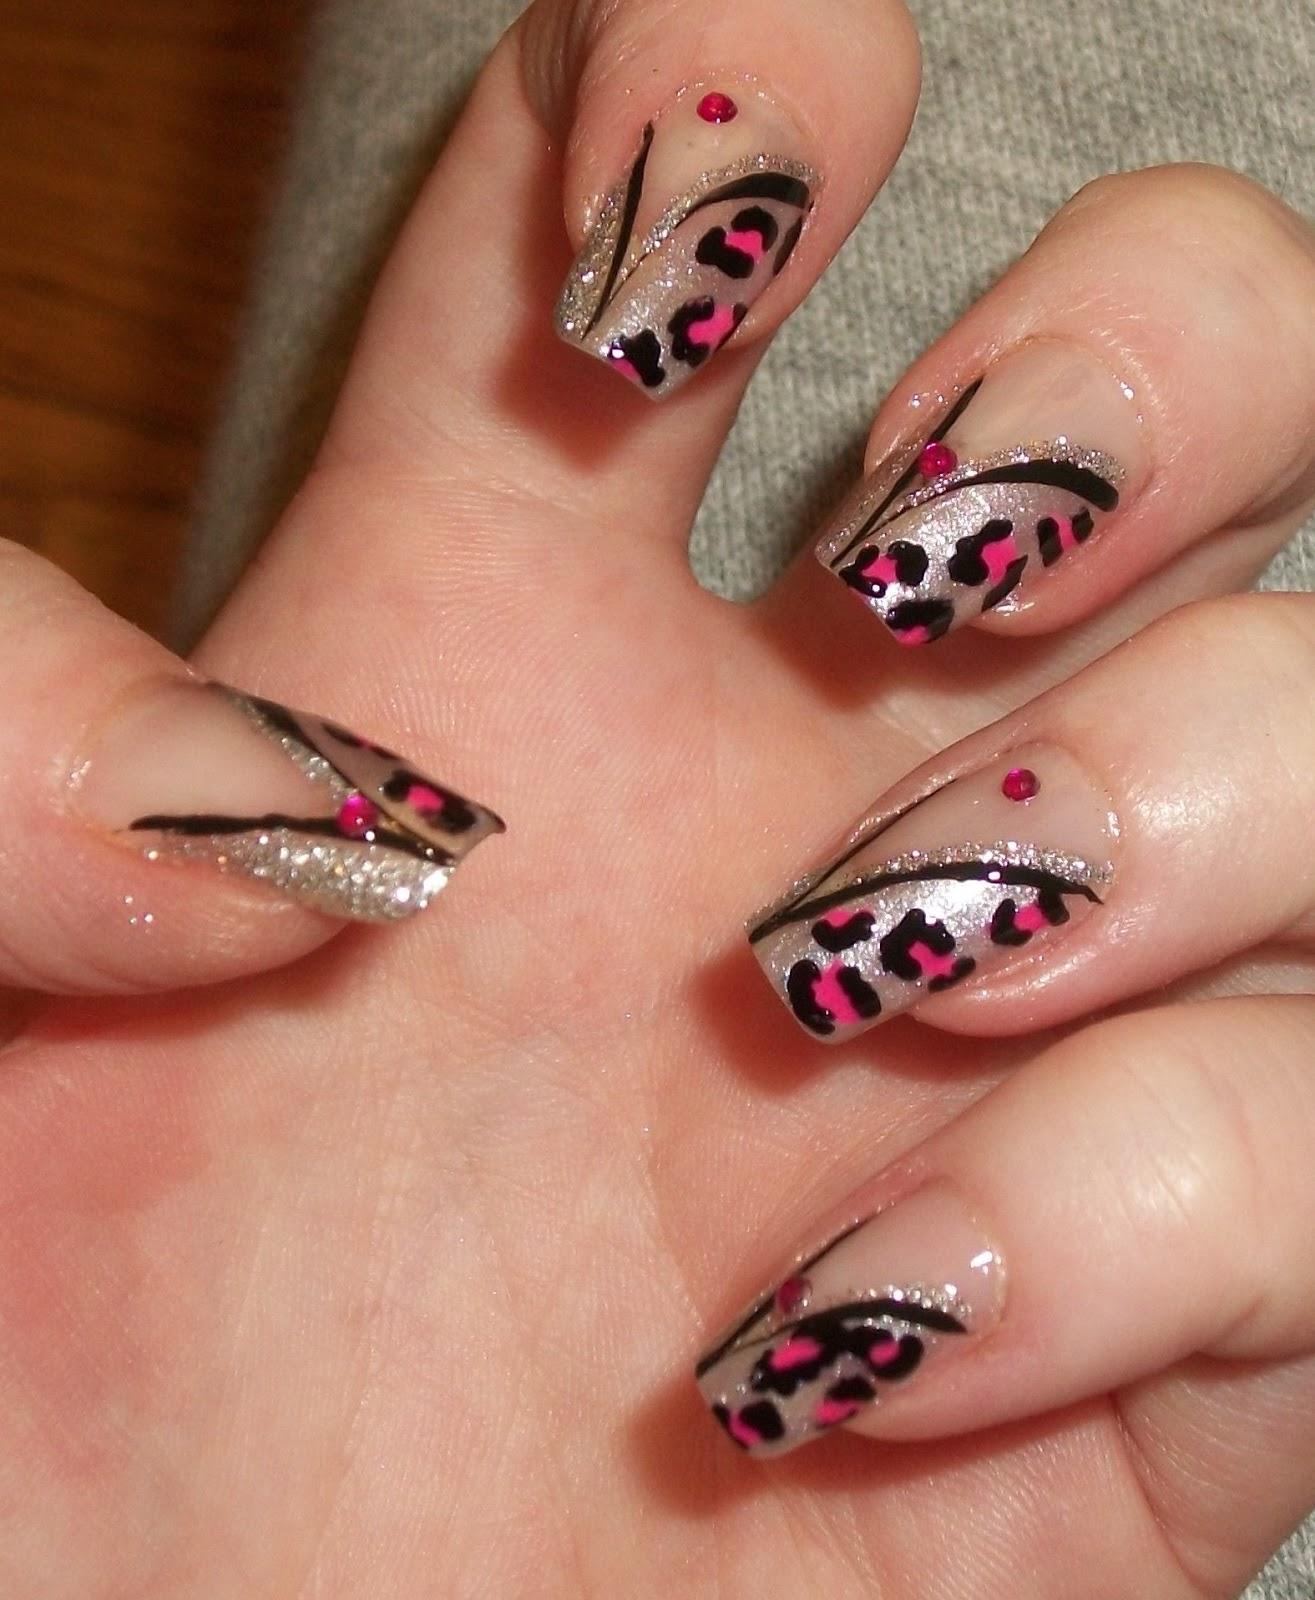 Diy Snow Leopard Nail Art: Love4NailArt: Snow Leopard Nail Art